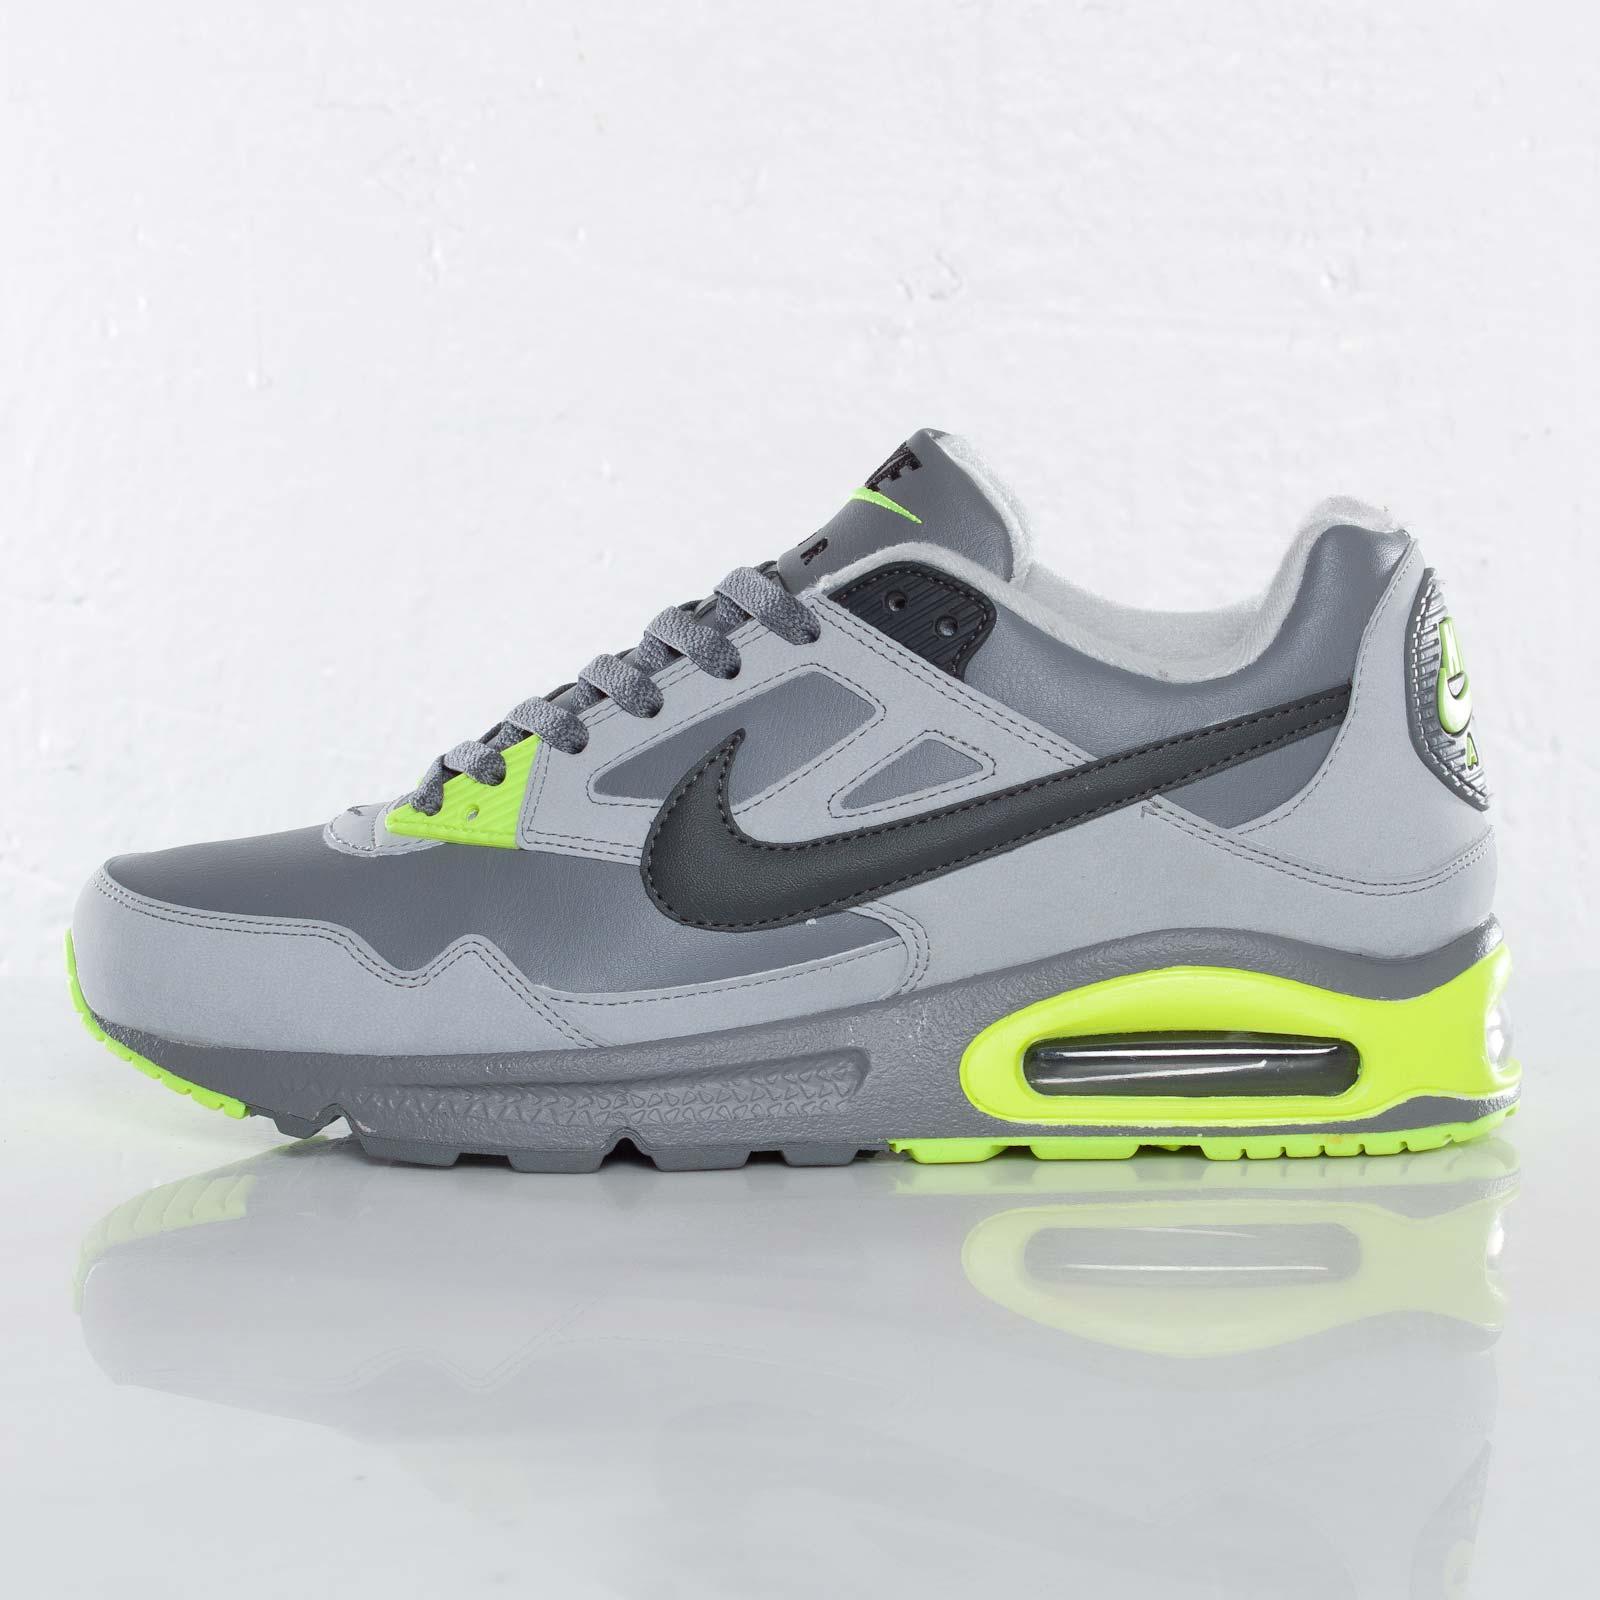 Nike Max Skyline EU Grey 343902019, gris, 40.5